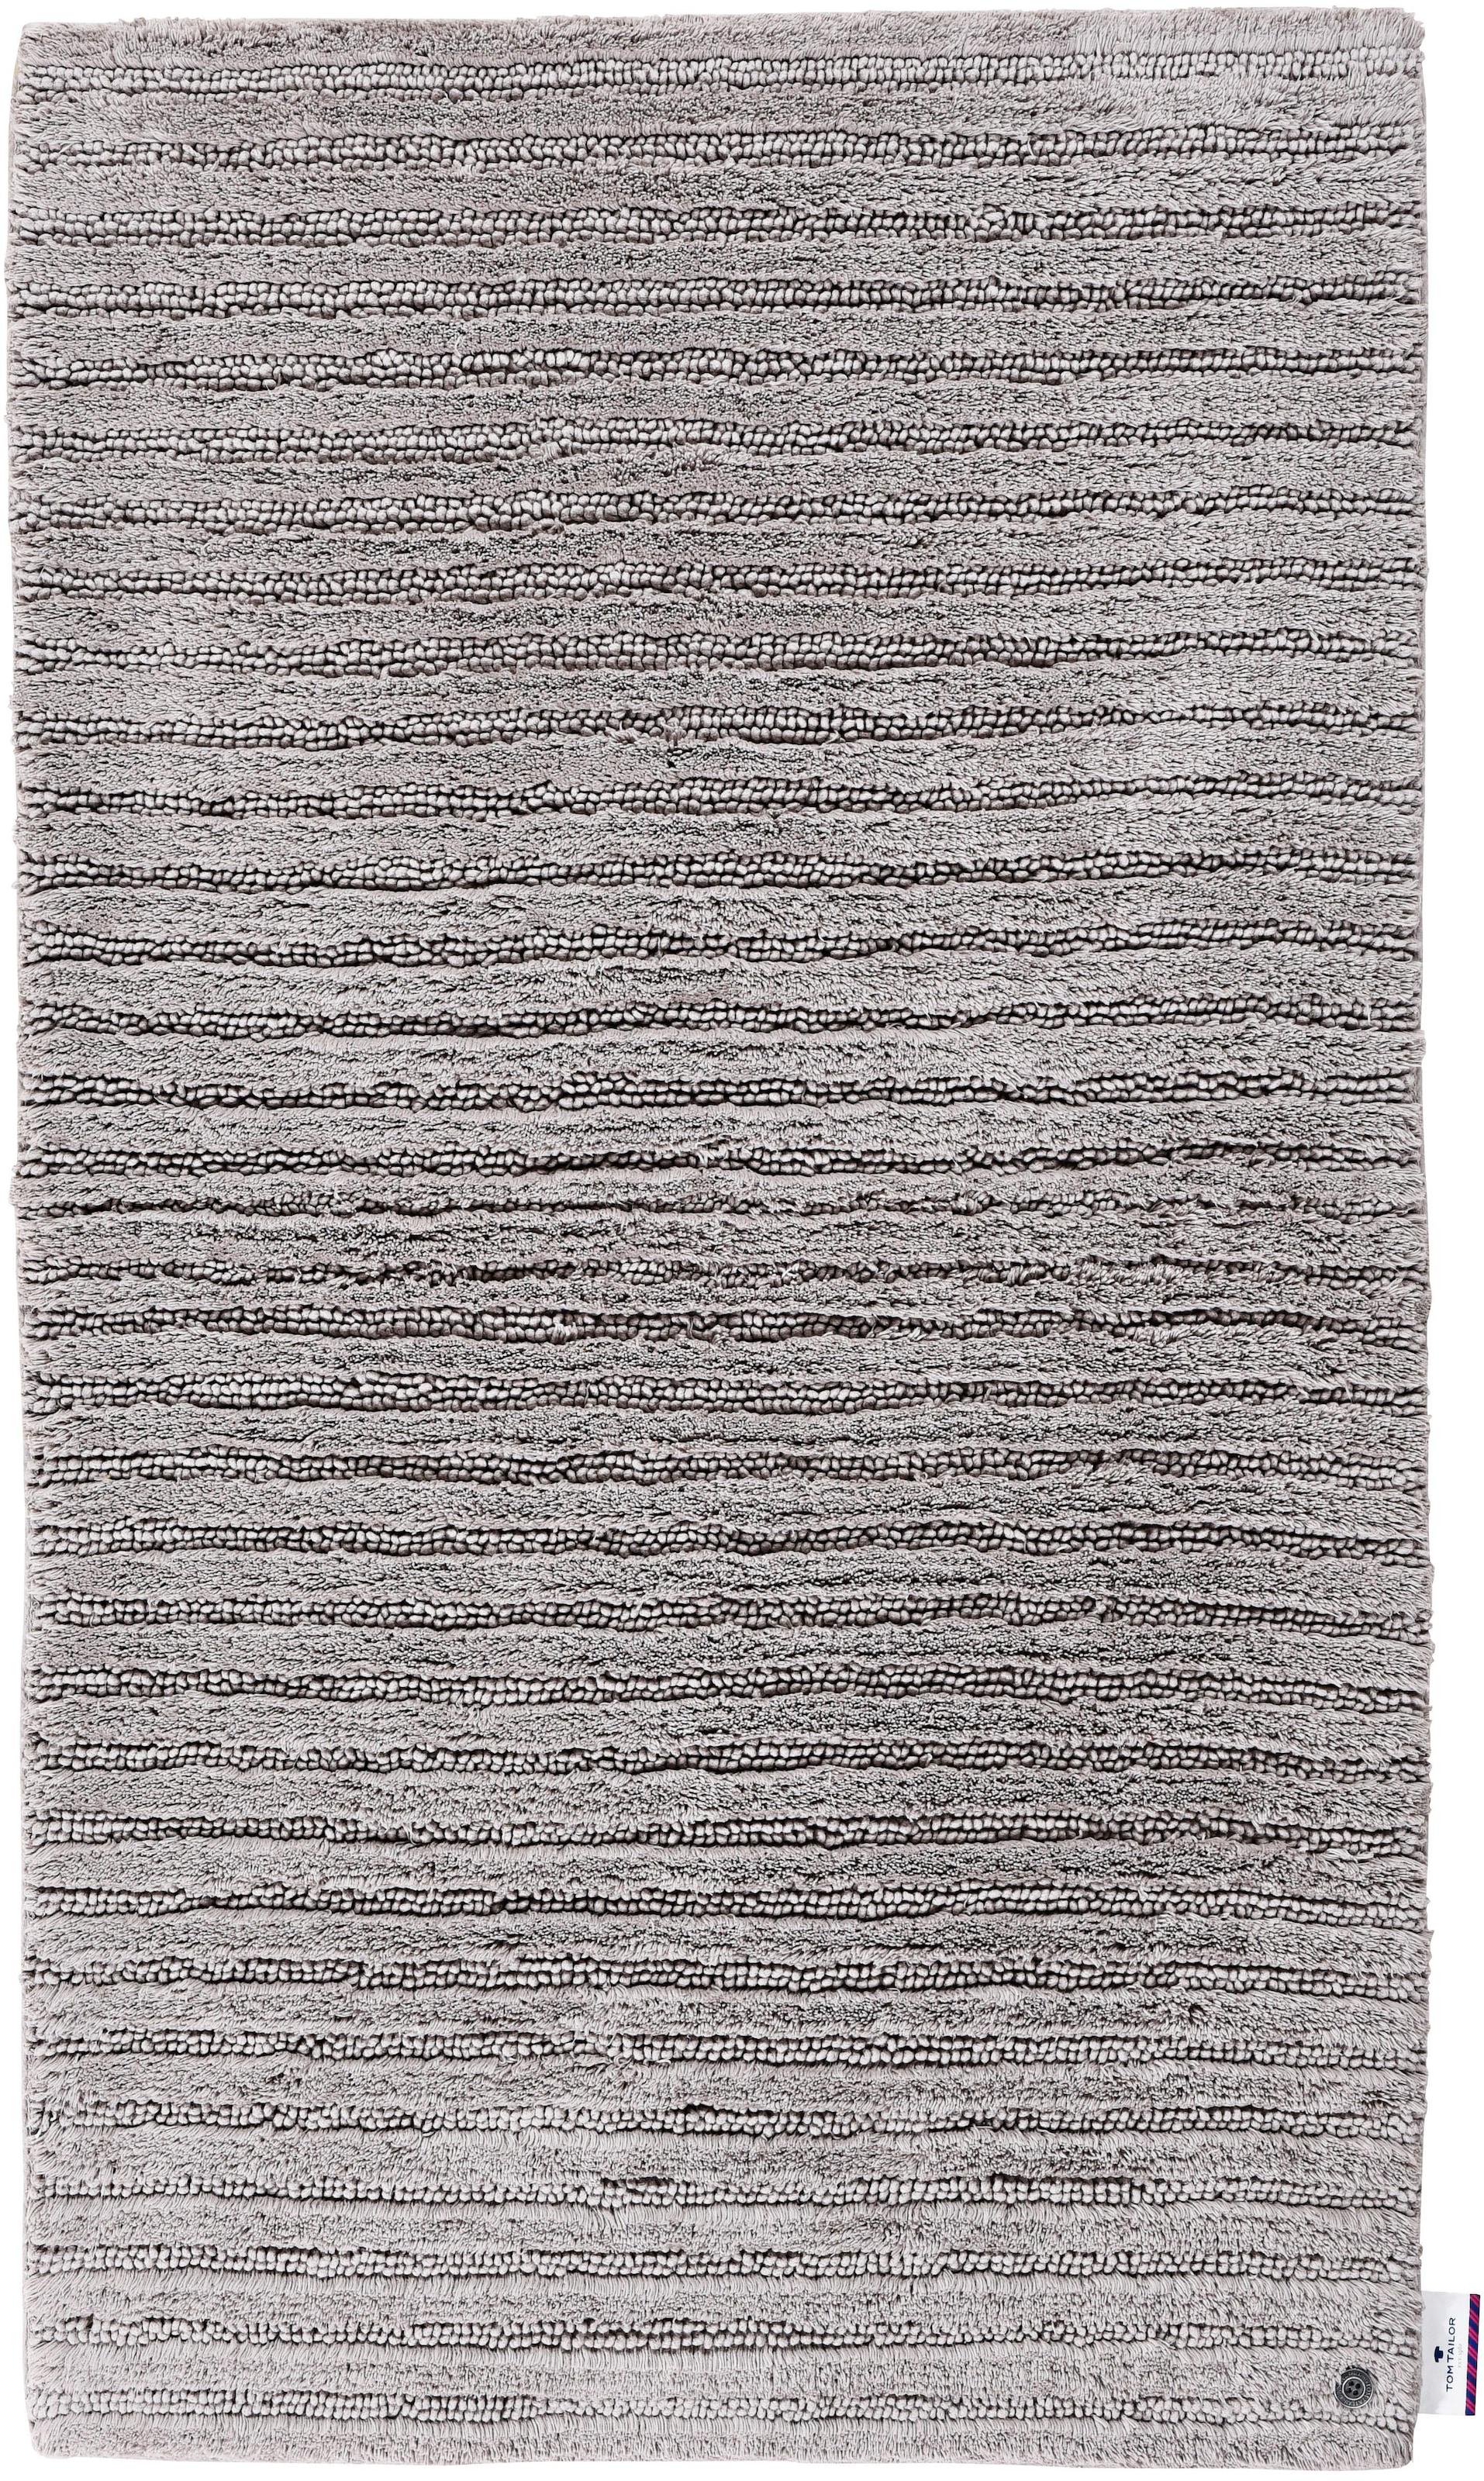 Image of Badematte »Cotton Stripes«, TOM TAILOR, Höhe 20 mm, fussbodenheizungsgeeignet